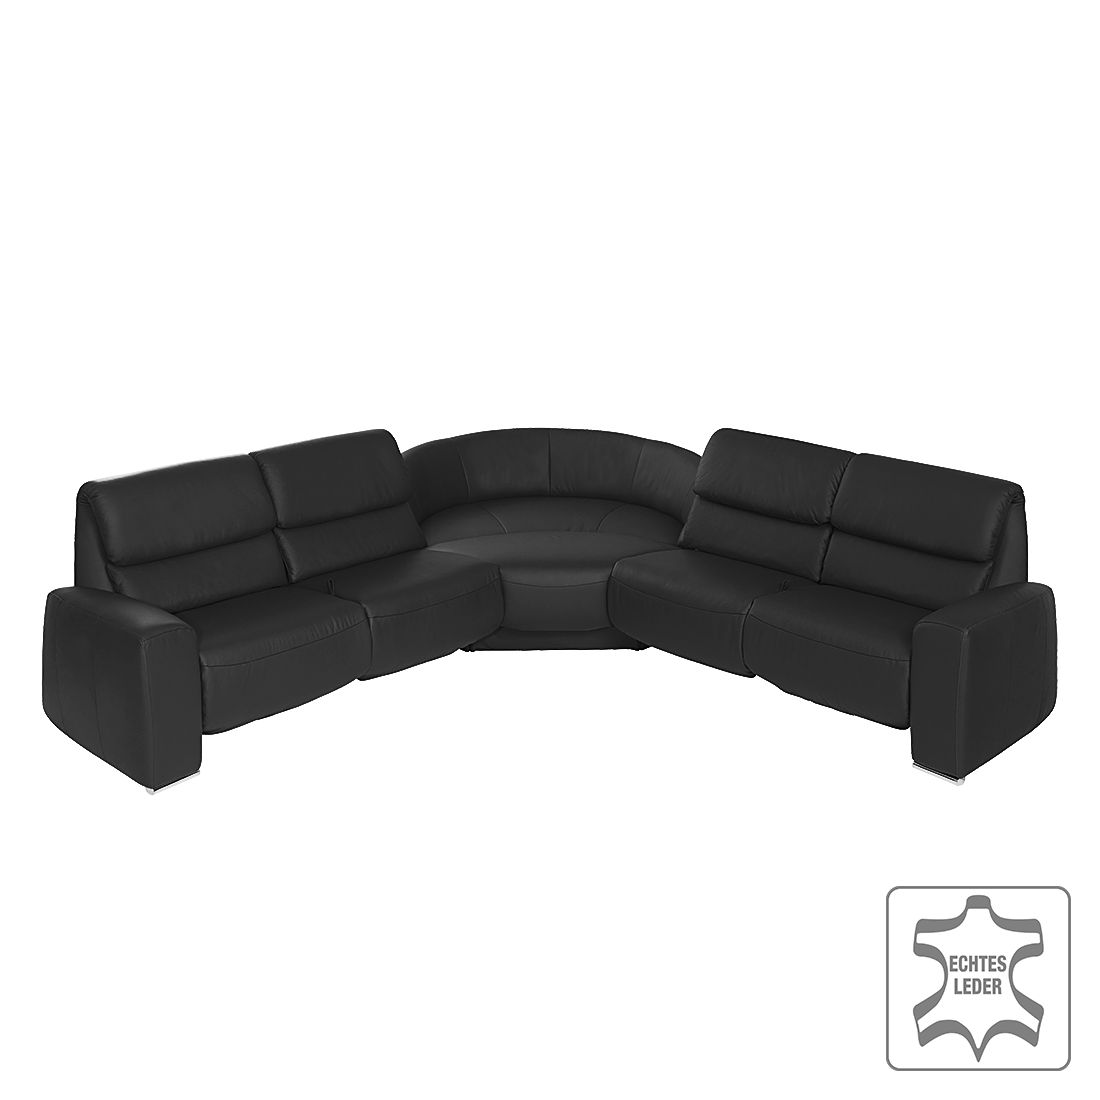 Canapé d'angle Space - Cuir véritable - Avec fonction relaxation - Noir, trendline by Ada